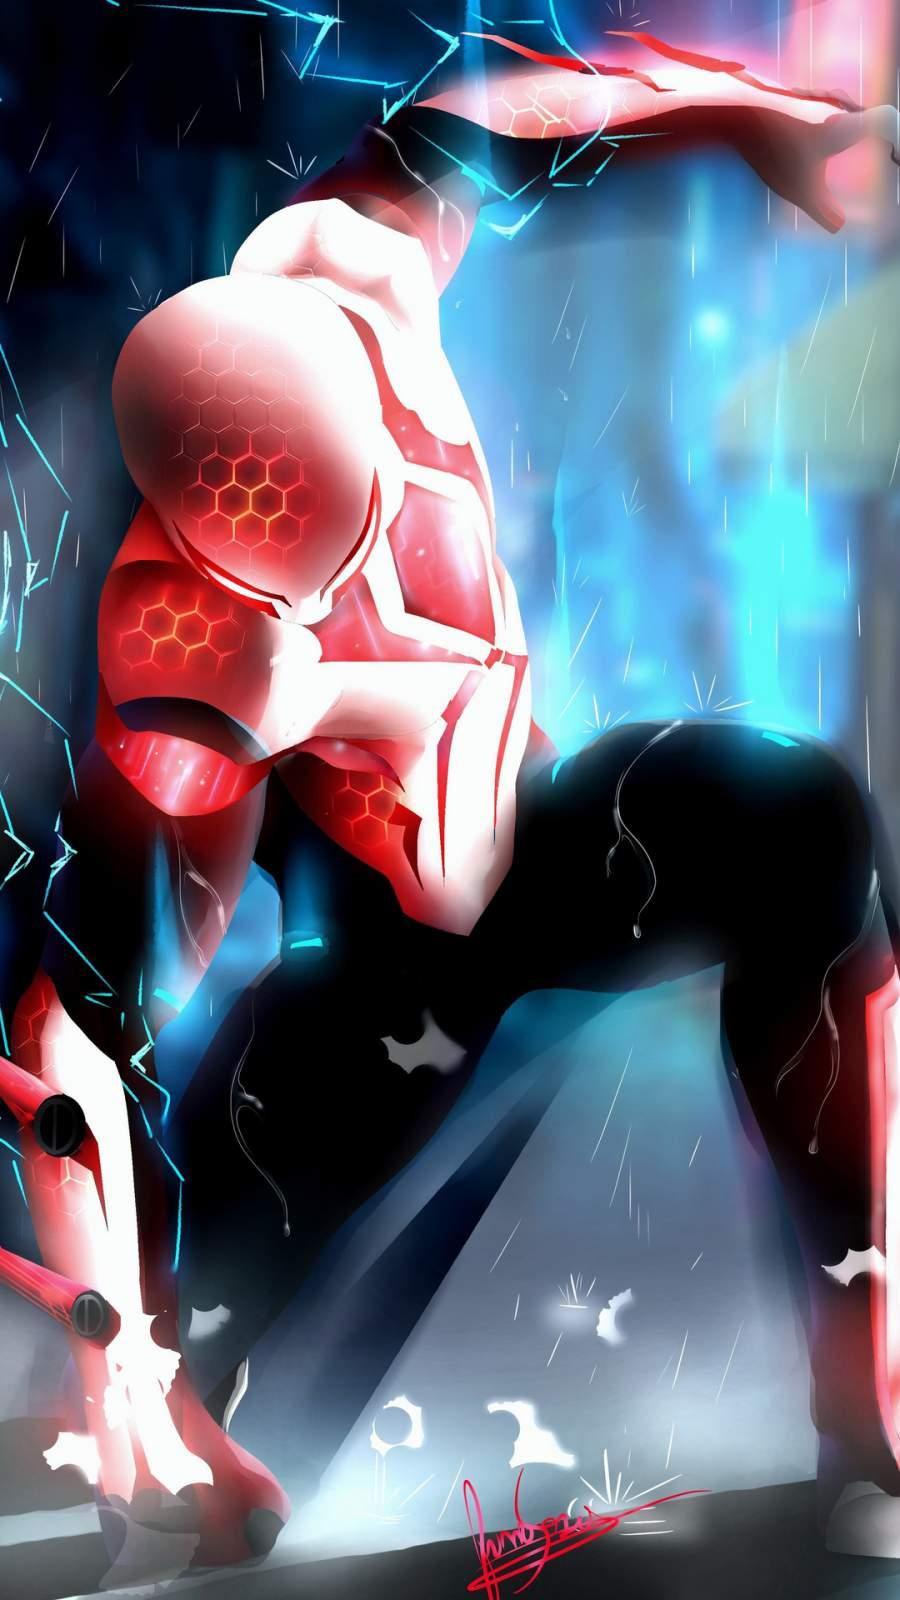 Spiderman 2049 iPhone Wallpaper